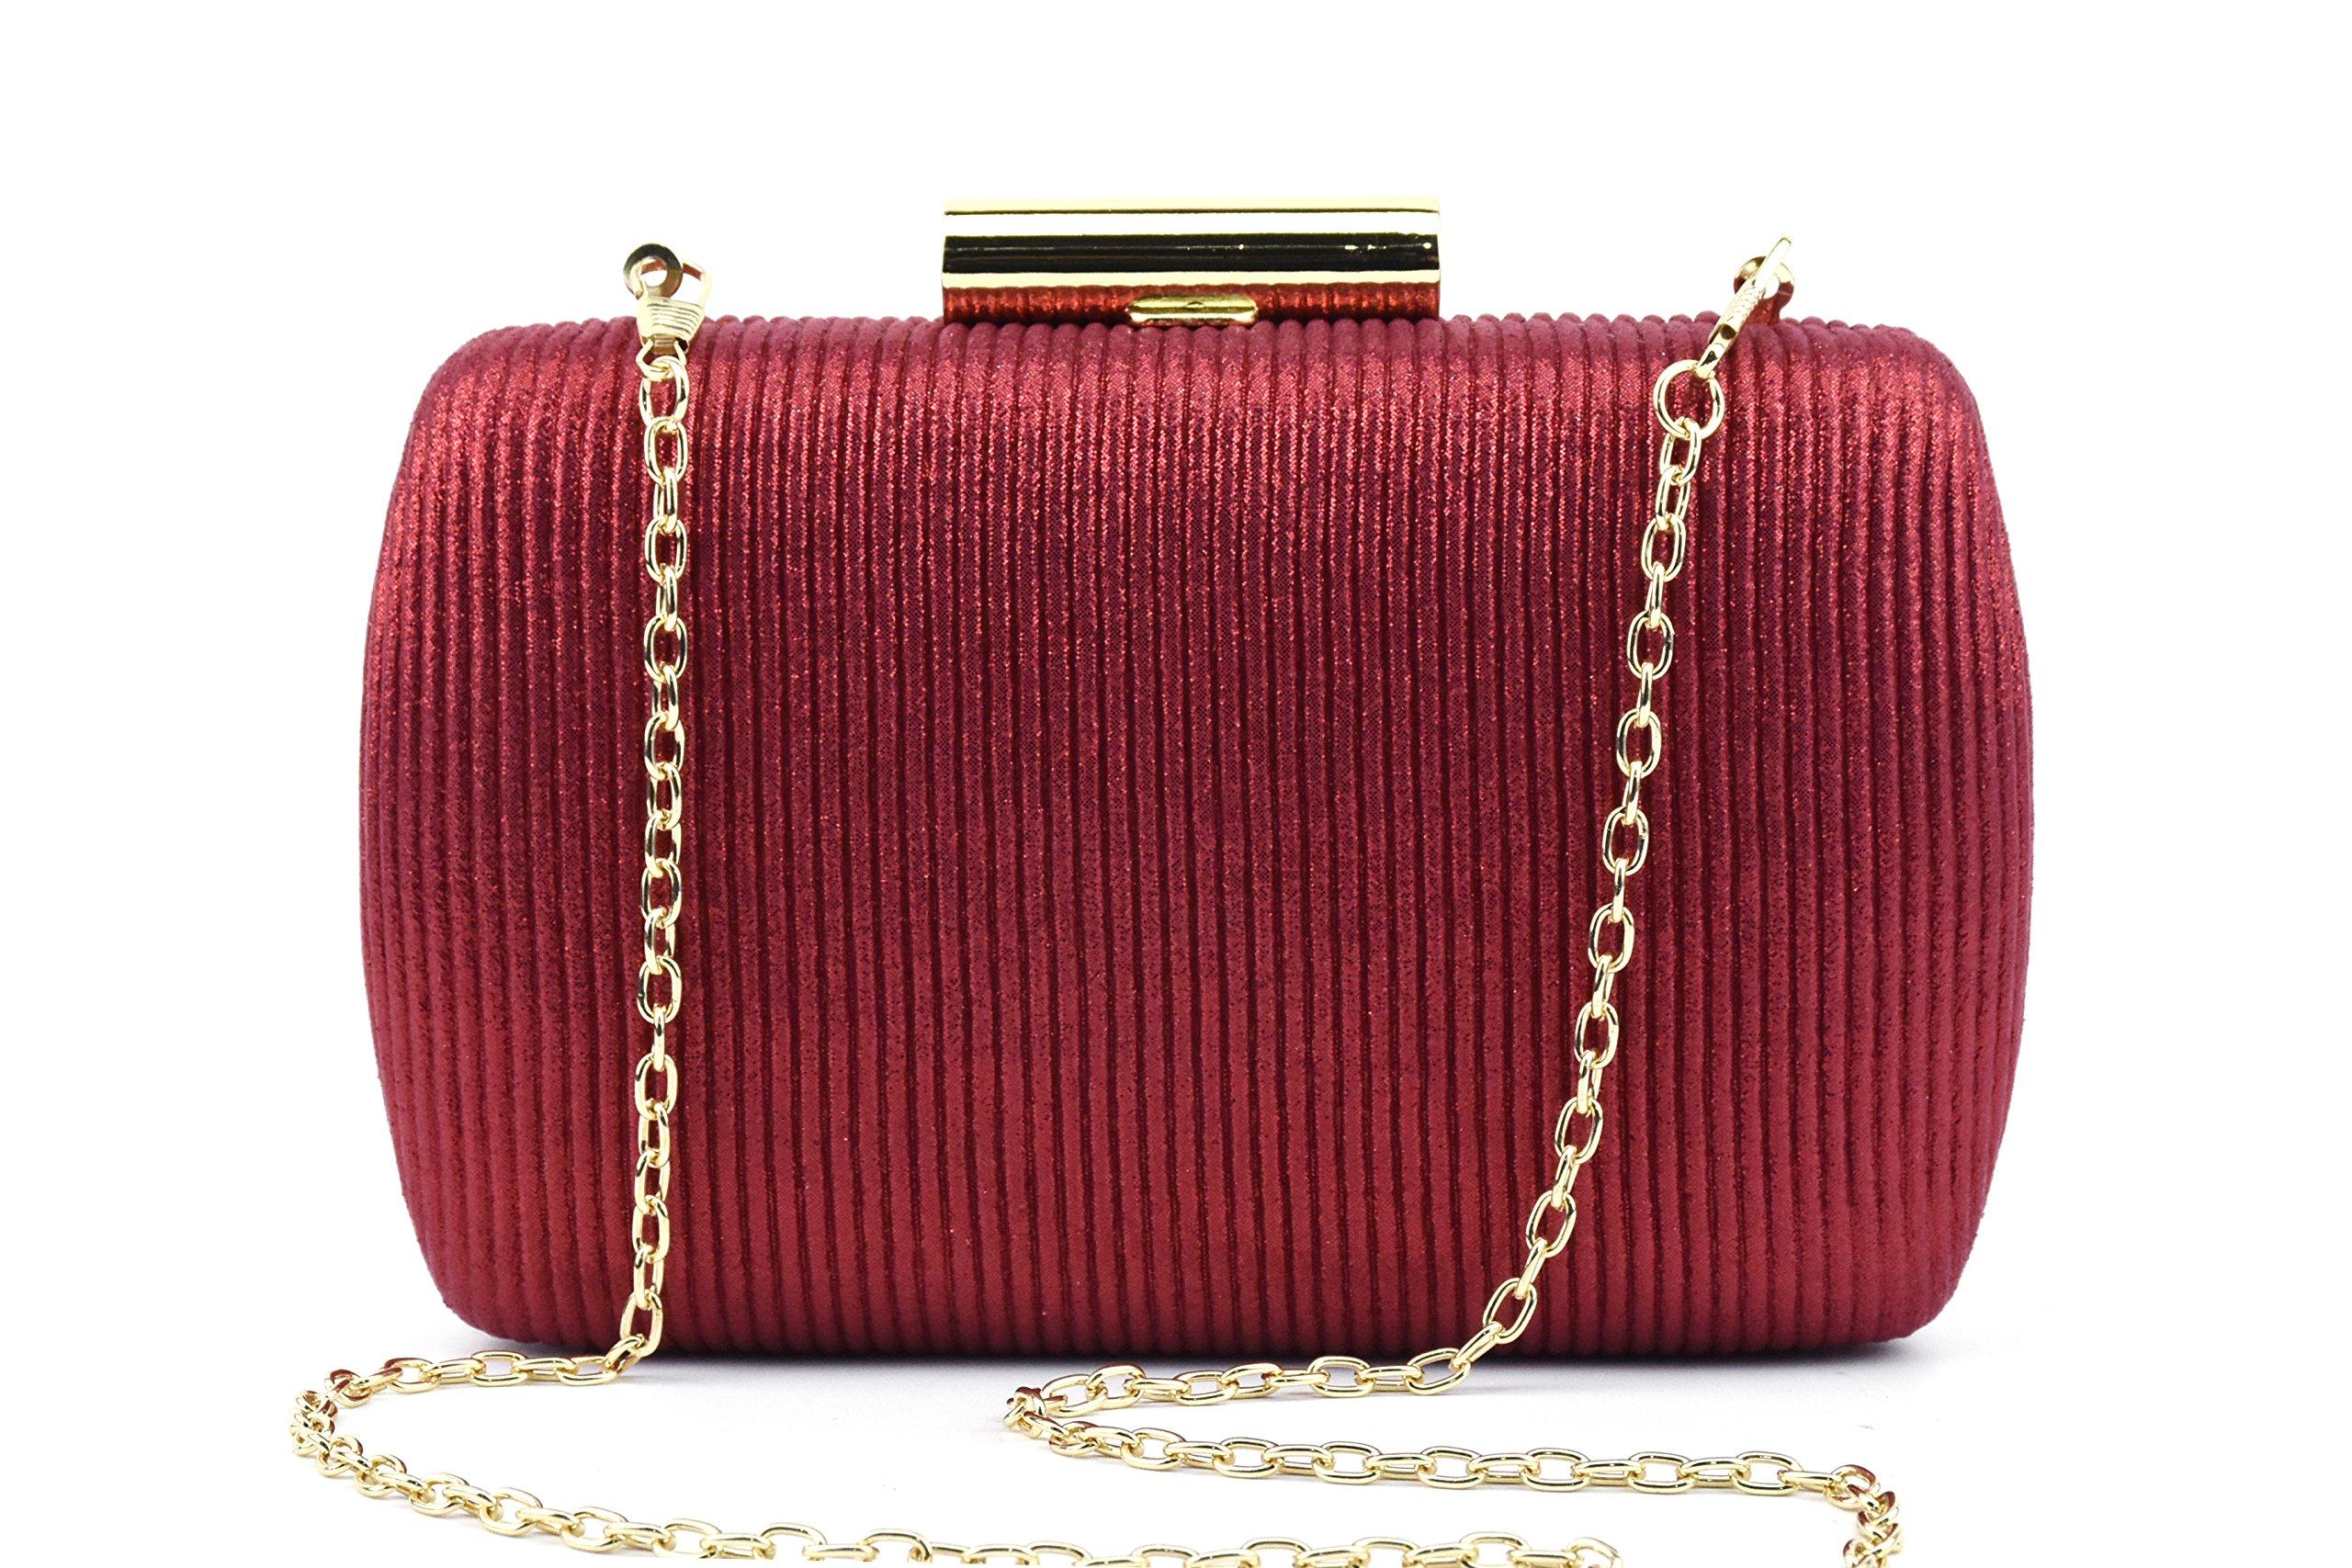 Ruiatoo Evening Clutch Purse Muti-color Clutch Handbag For Women Party/Wedding Bag Red